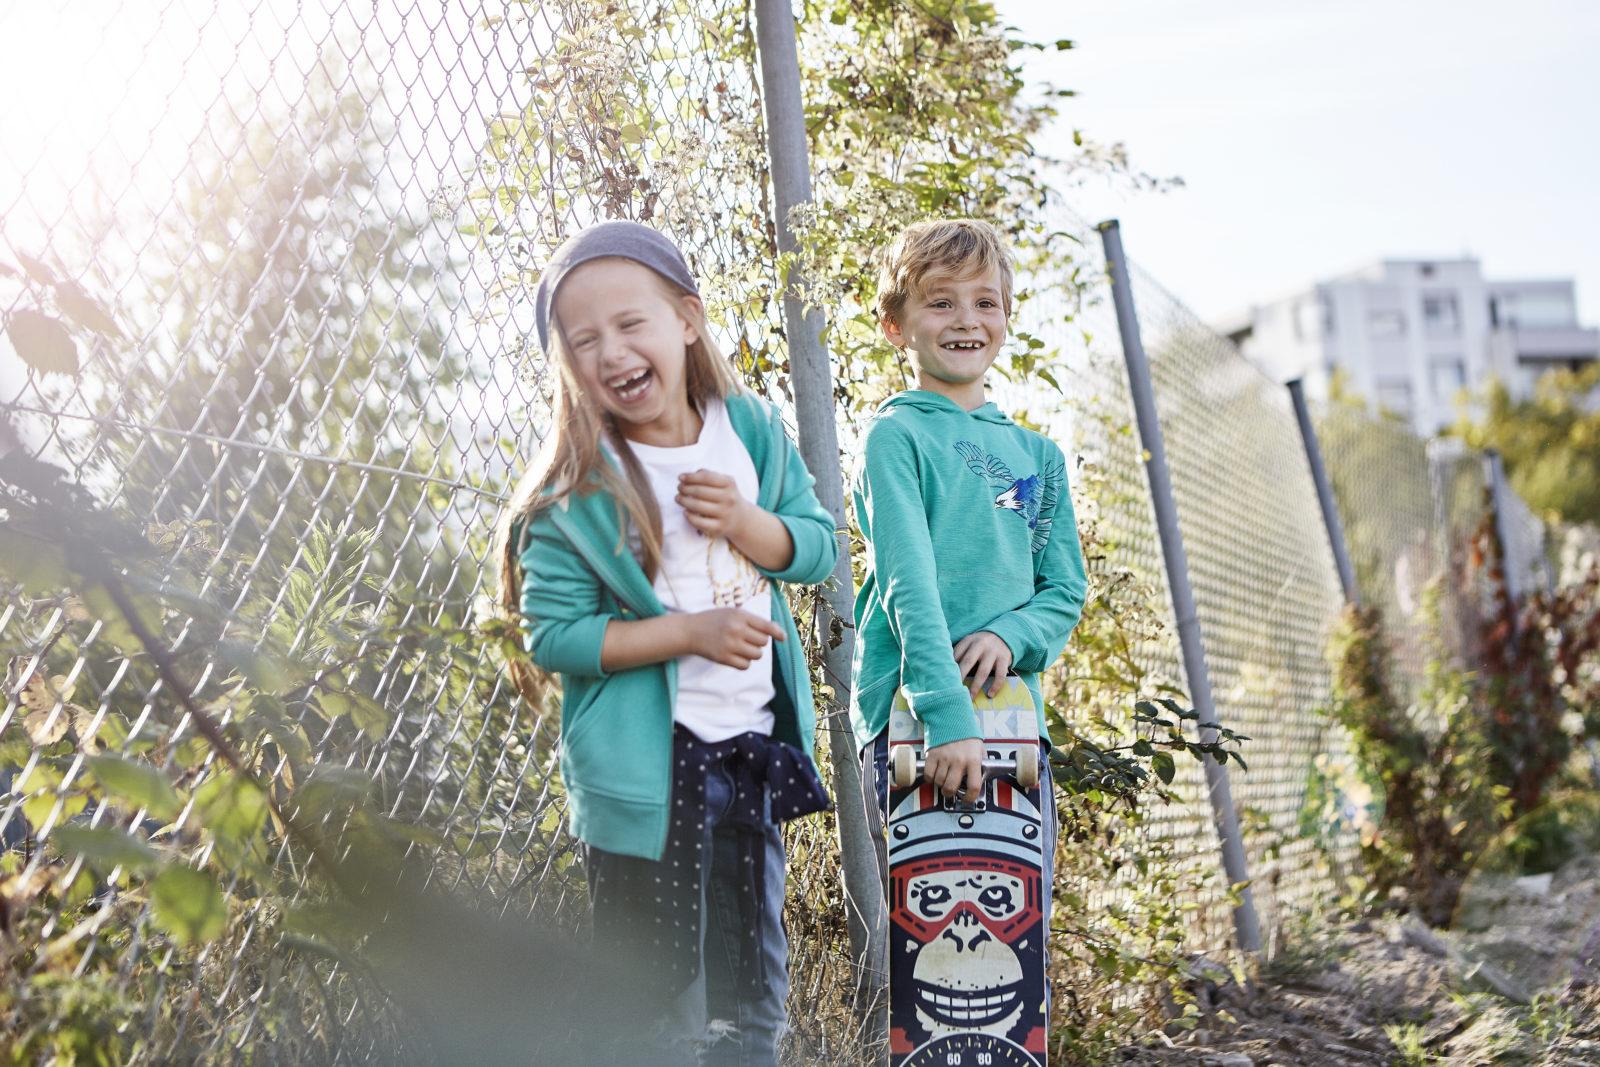 Kleine Spatzen | Kindermode | Maike Ostermeier und Alexandra Dittschar | Ratingen | Foto: Claudia Neue | GROSS∆RTIG